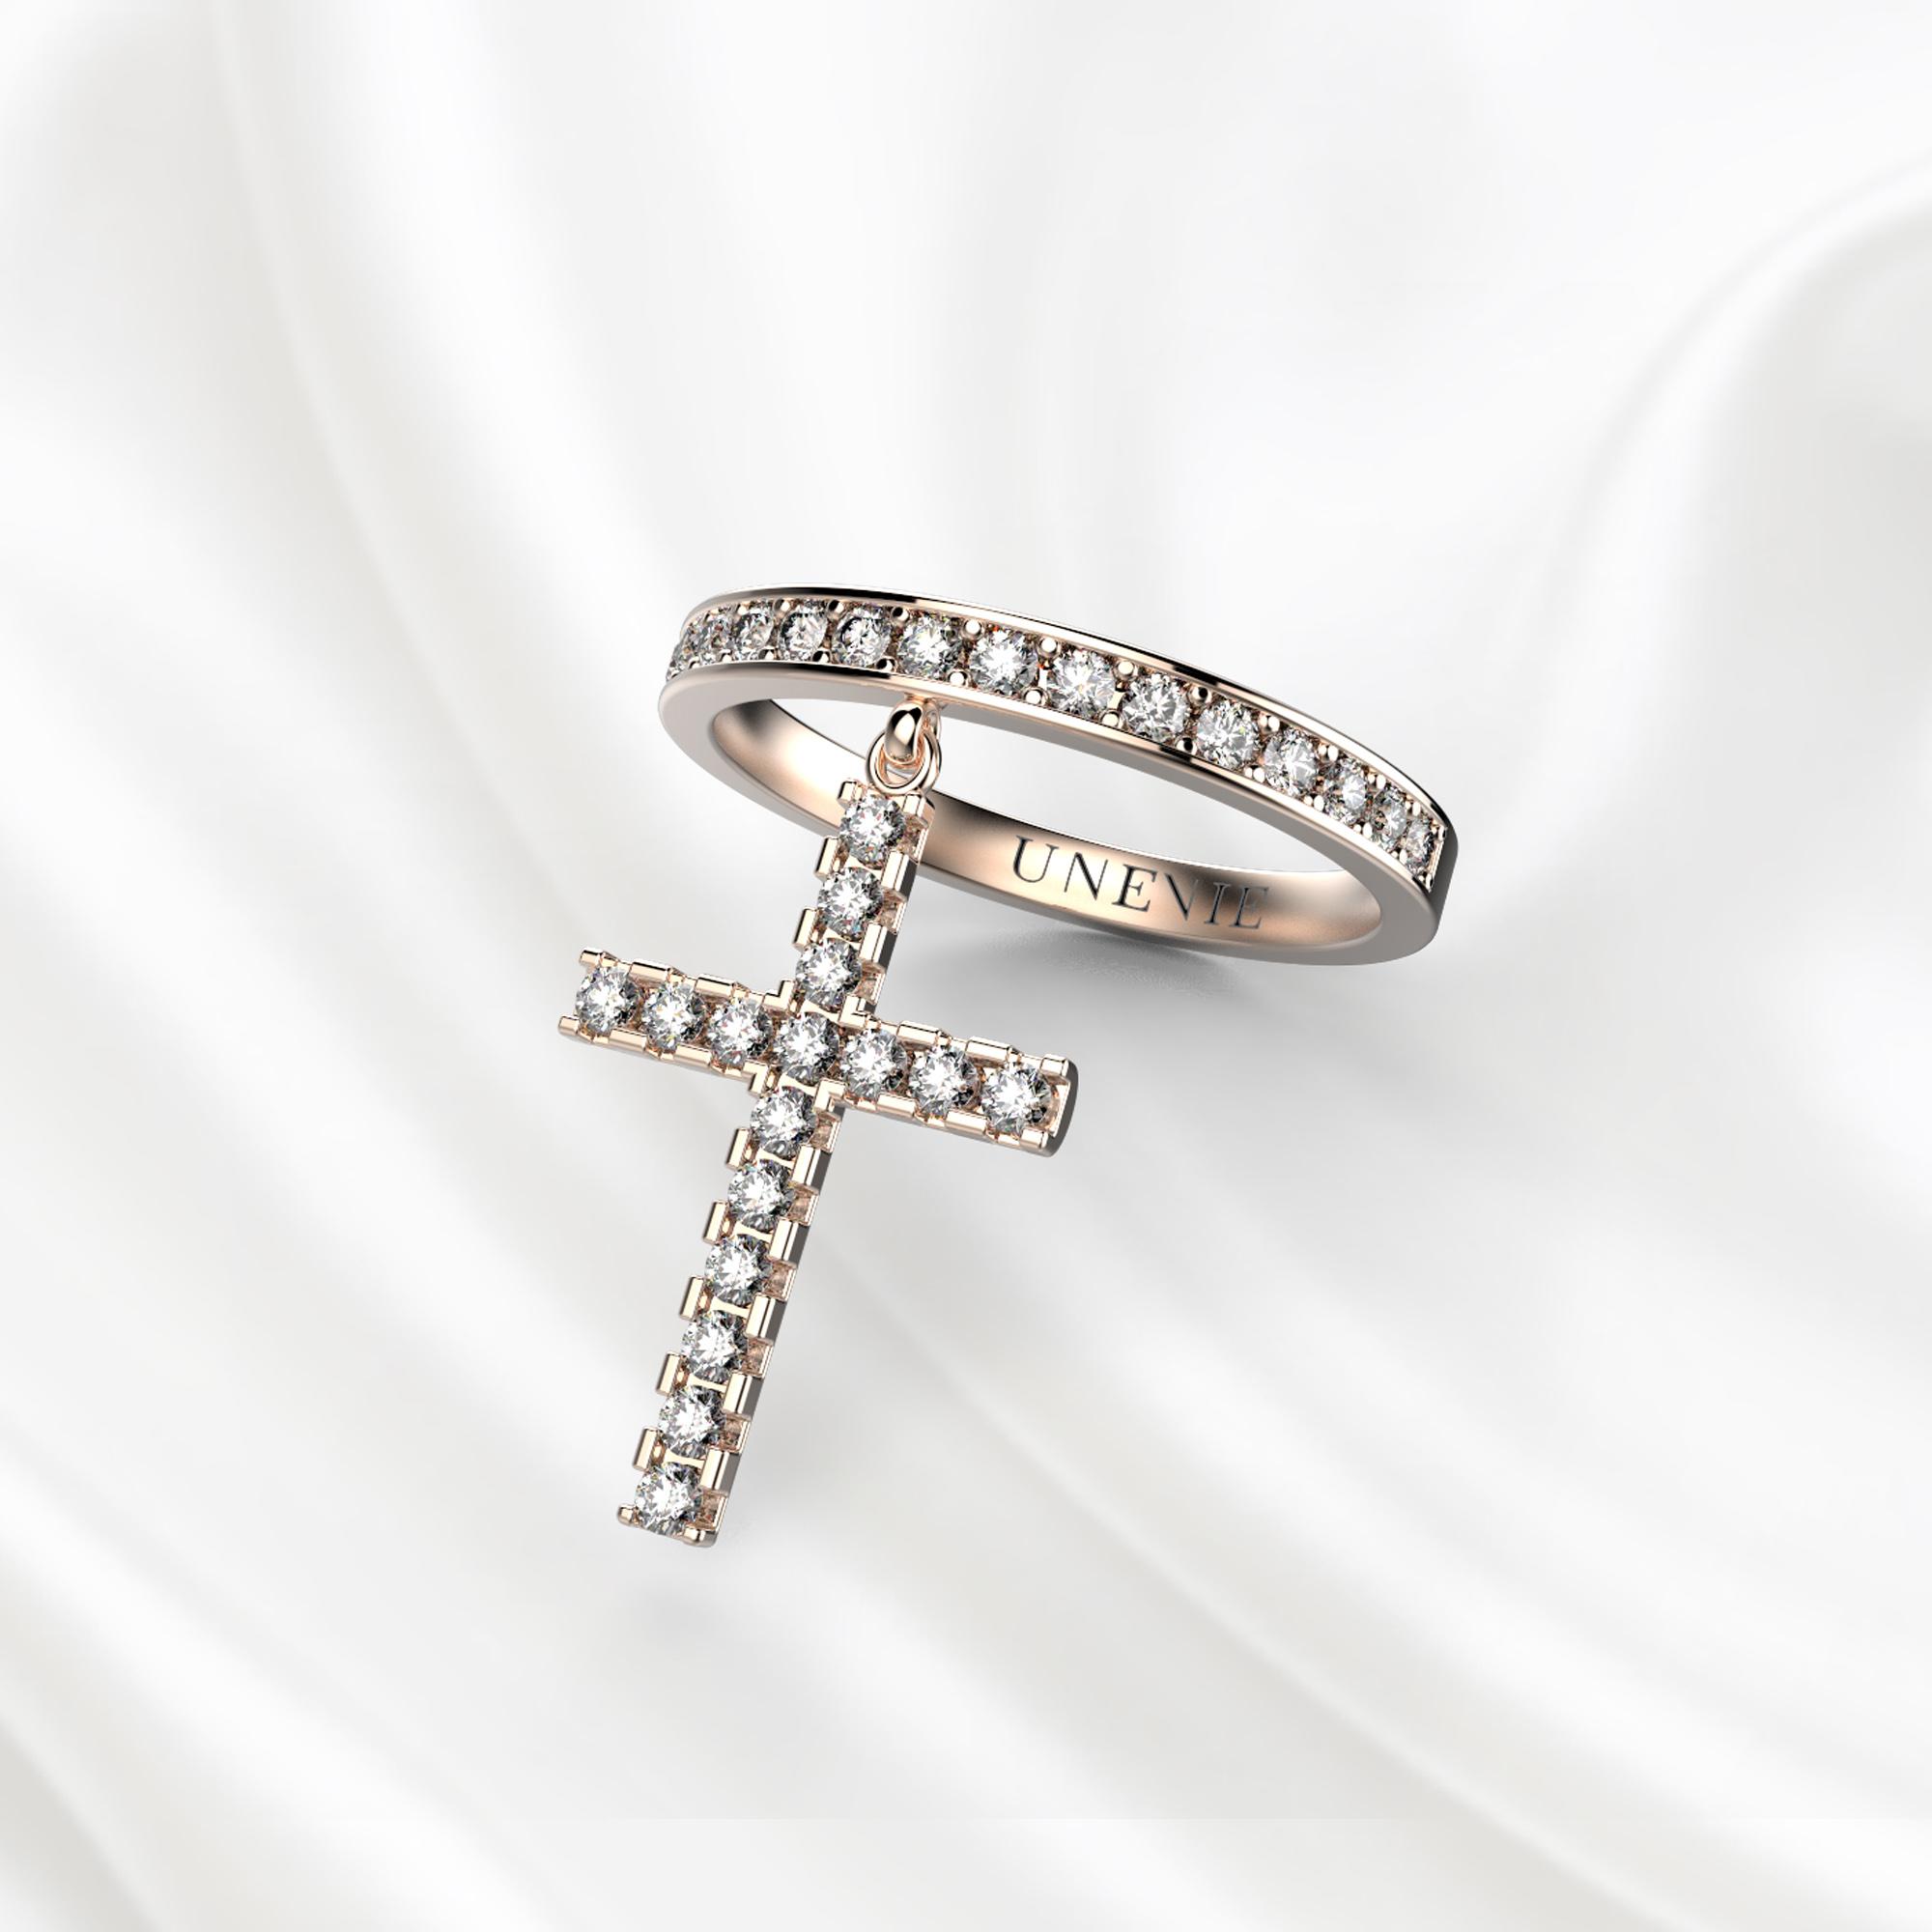 E13 Кольцо из розового золота с крестом и бриллиантами